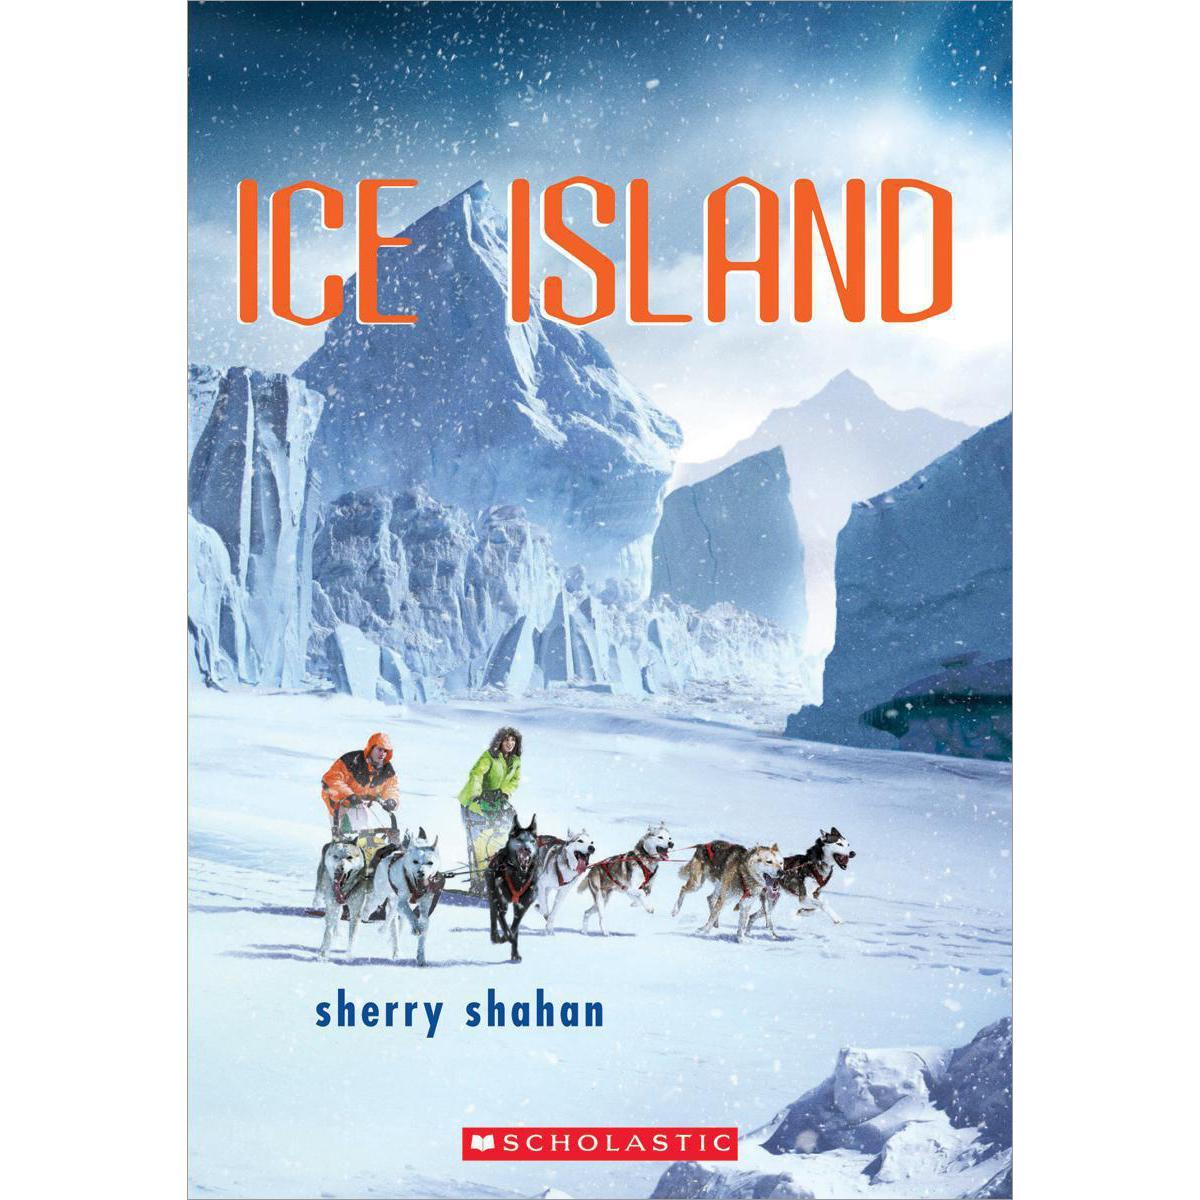 Ice Island 10-Pack